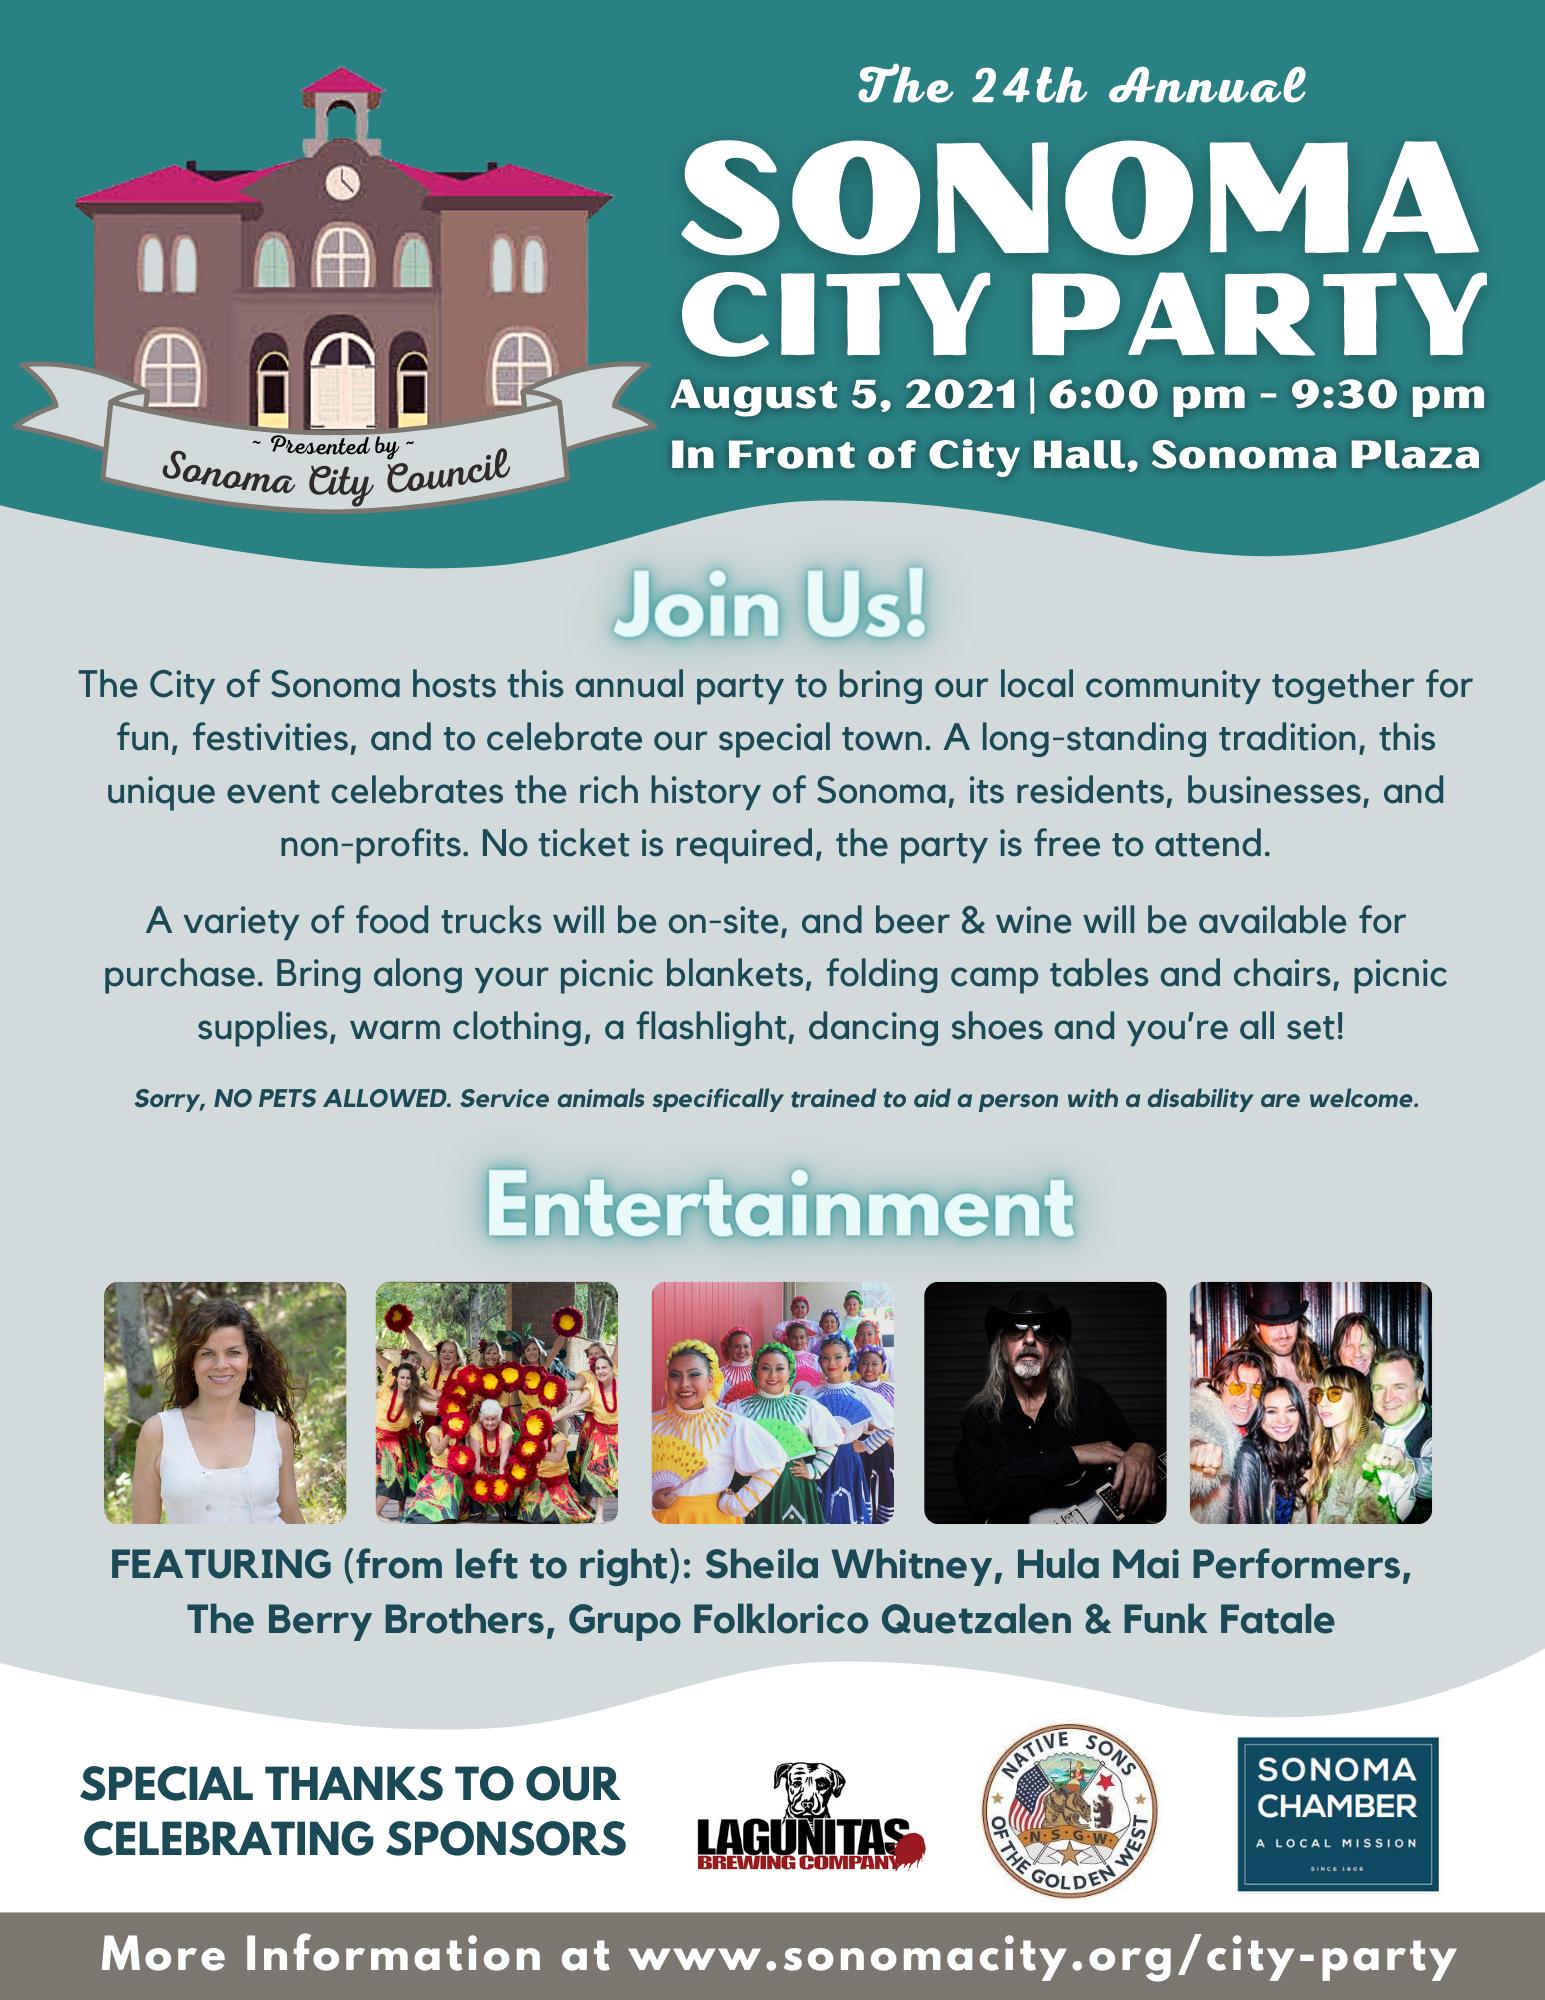 Sonoma City Party Flyer, English